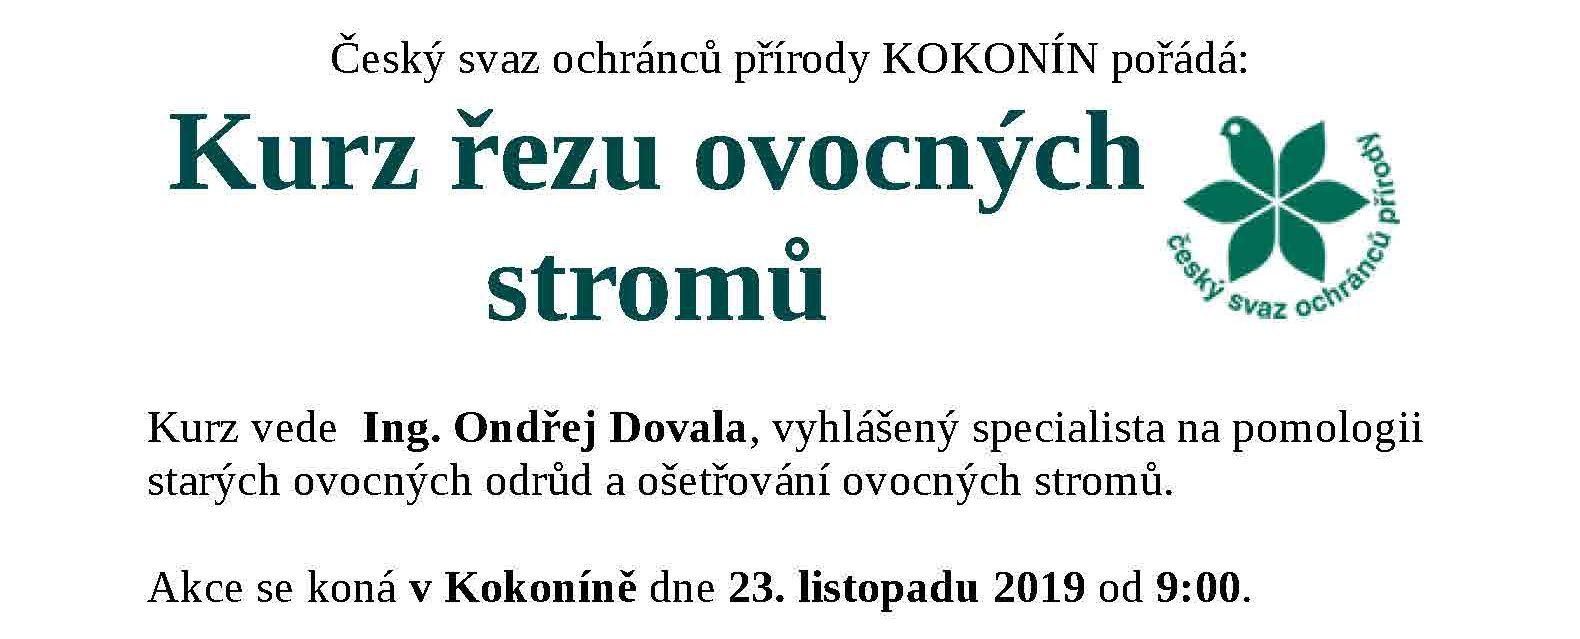 http://mykokonin.cz/wp-content/uploads/2019/11/1911kurz_rezu.pdf